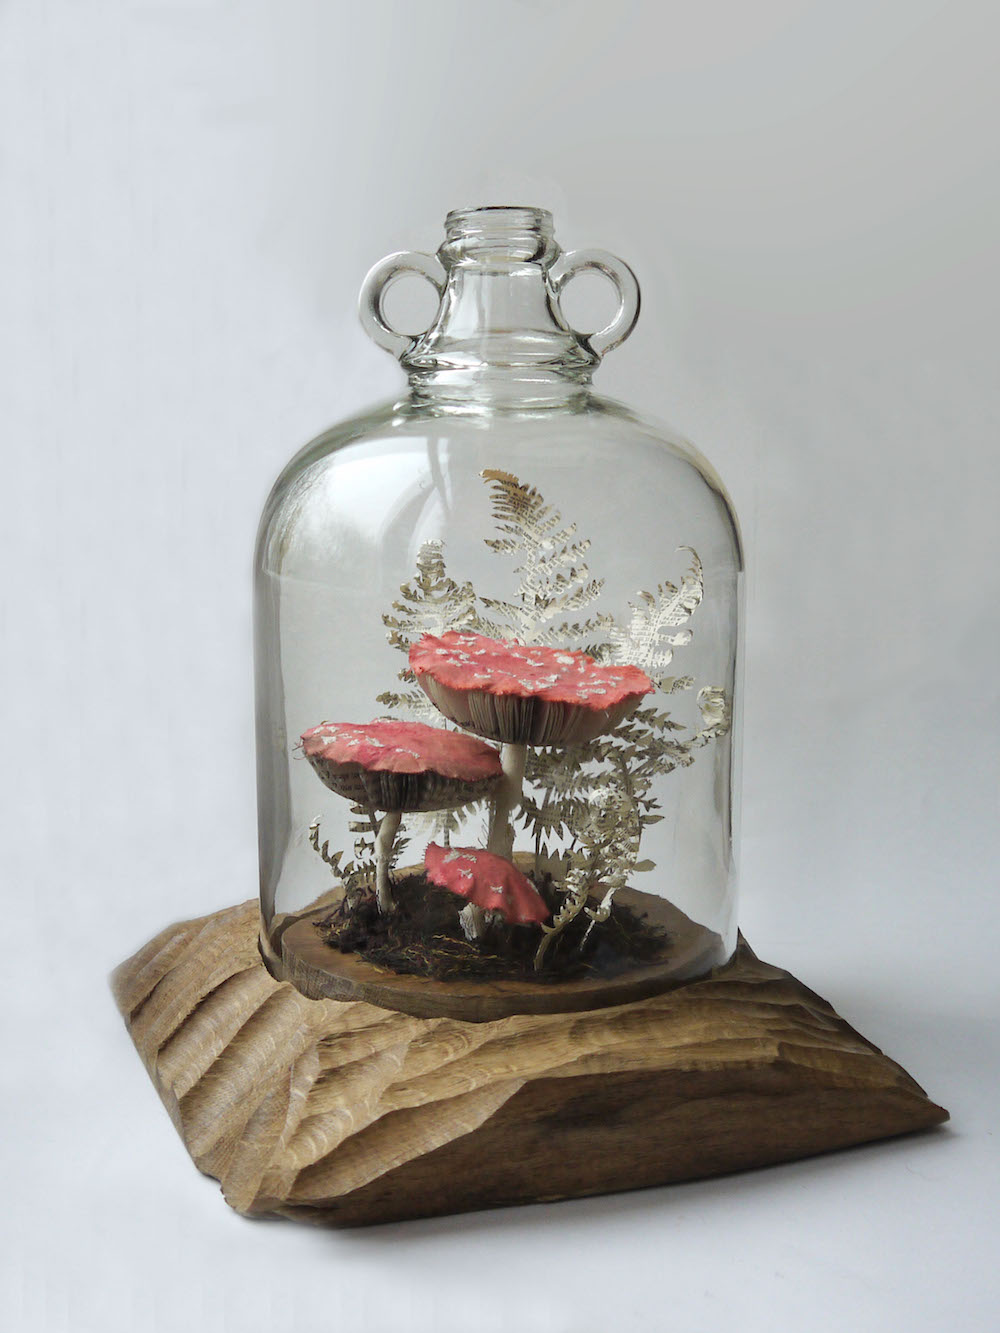 artista-apaixonada-pela-natureza-kate-kato-blog-usenatureza